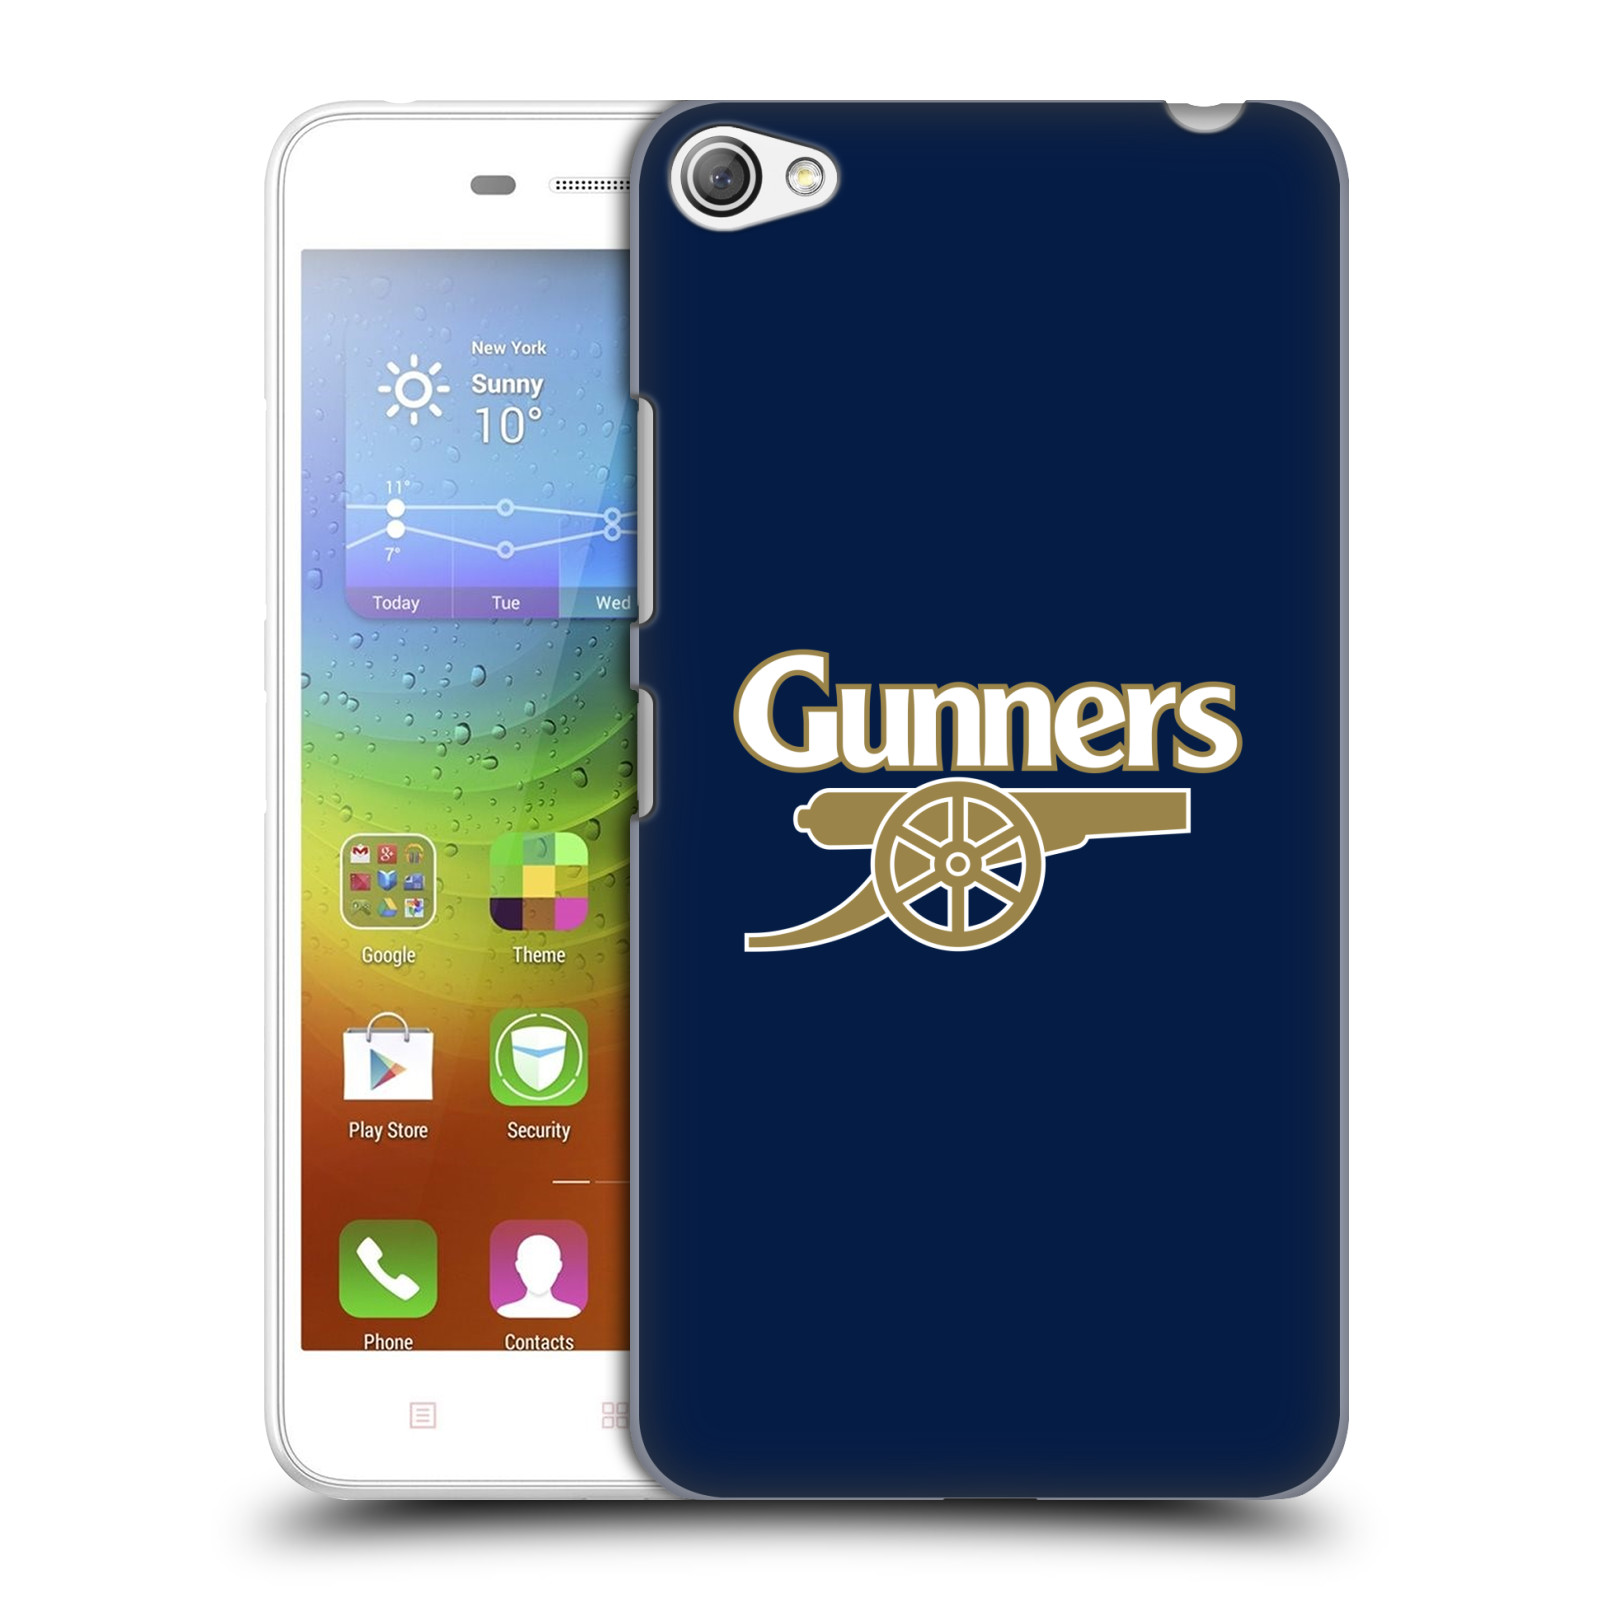 Plastové pouzdro na mobil Lenovo S60 - Head Case - Arsenal FC - Gunners